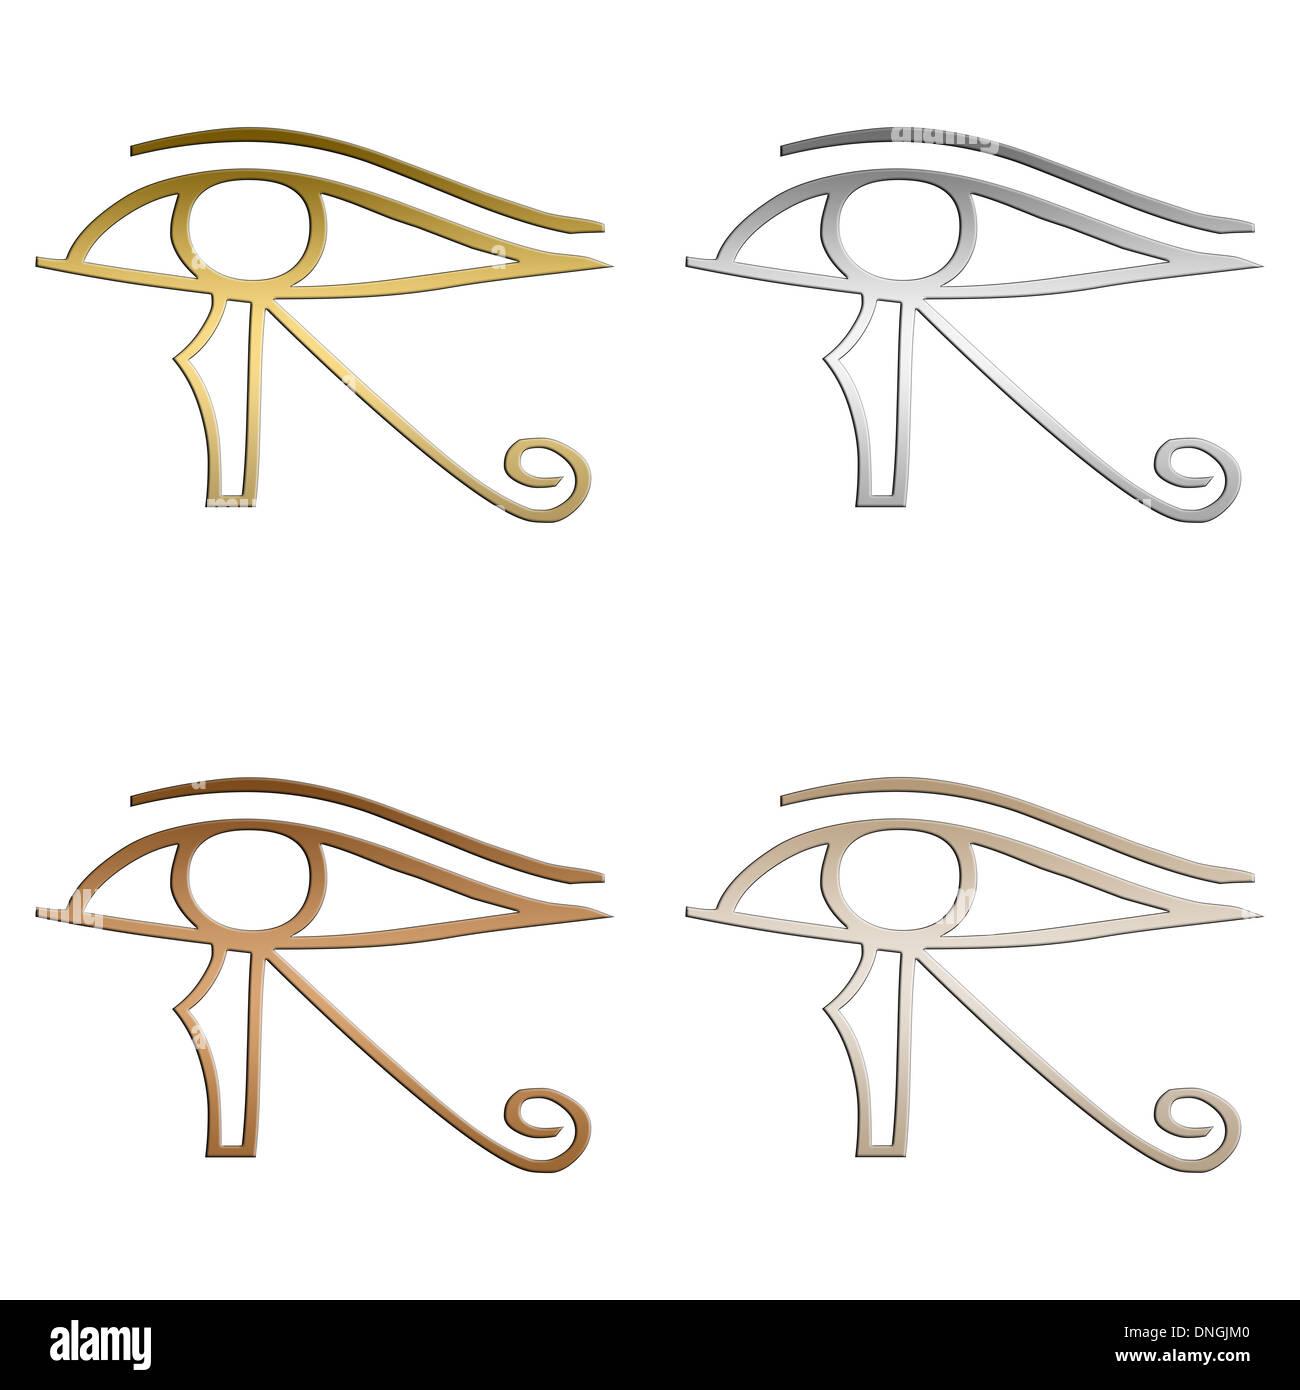 Egyptian Gods Stock Photos Egyptian Gods Stock Images Alamy